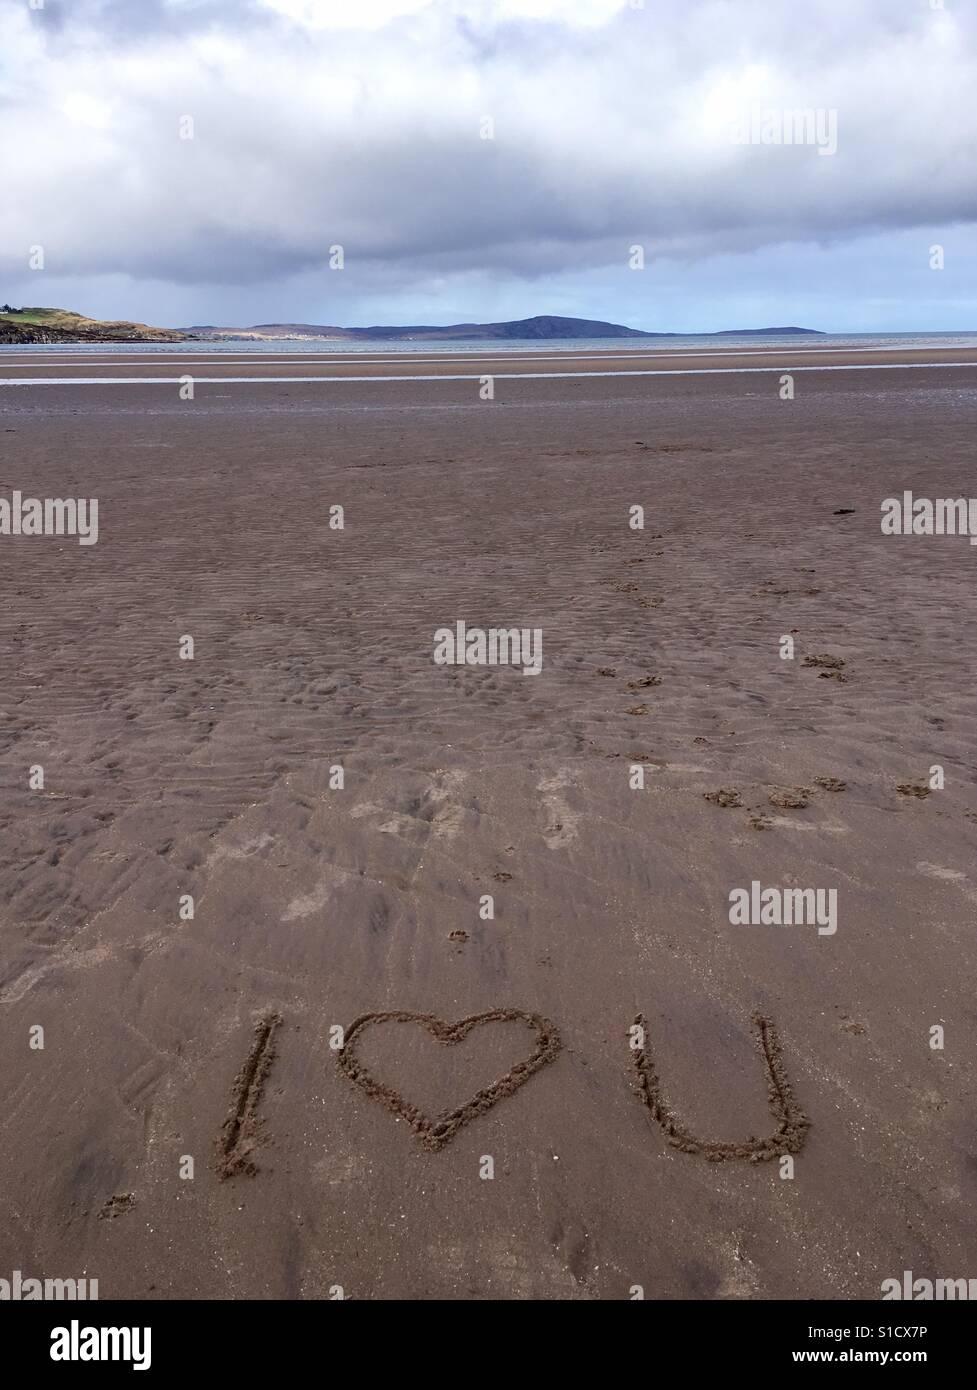 'I love you' written in sand, Gruinard Beach, Webster Ross, Scotland - Stock Image